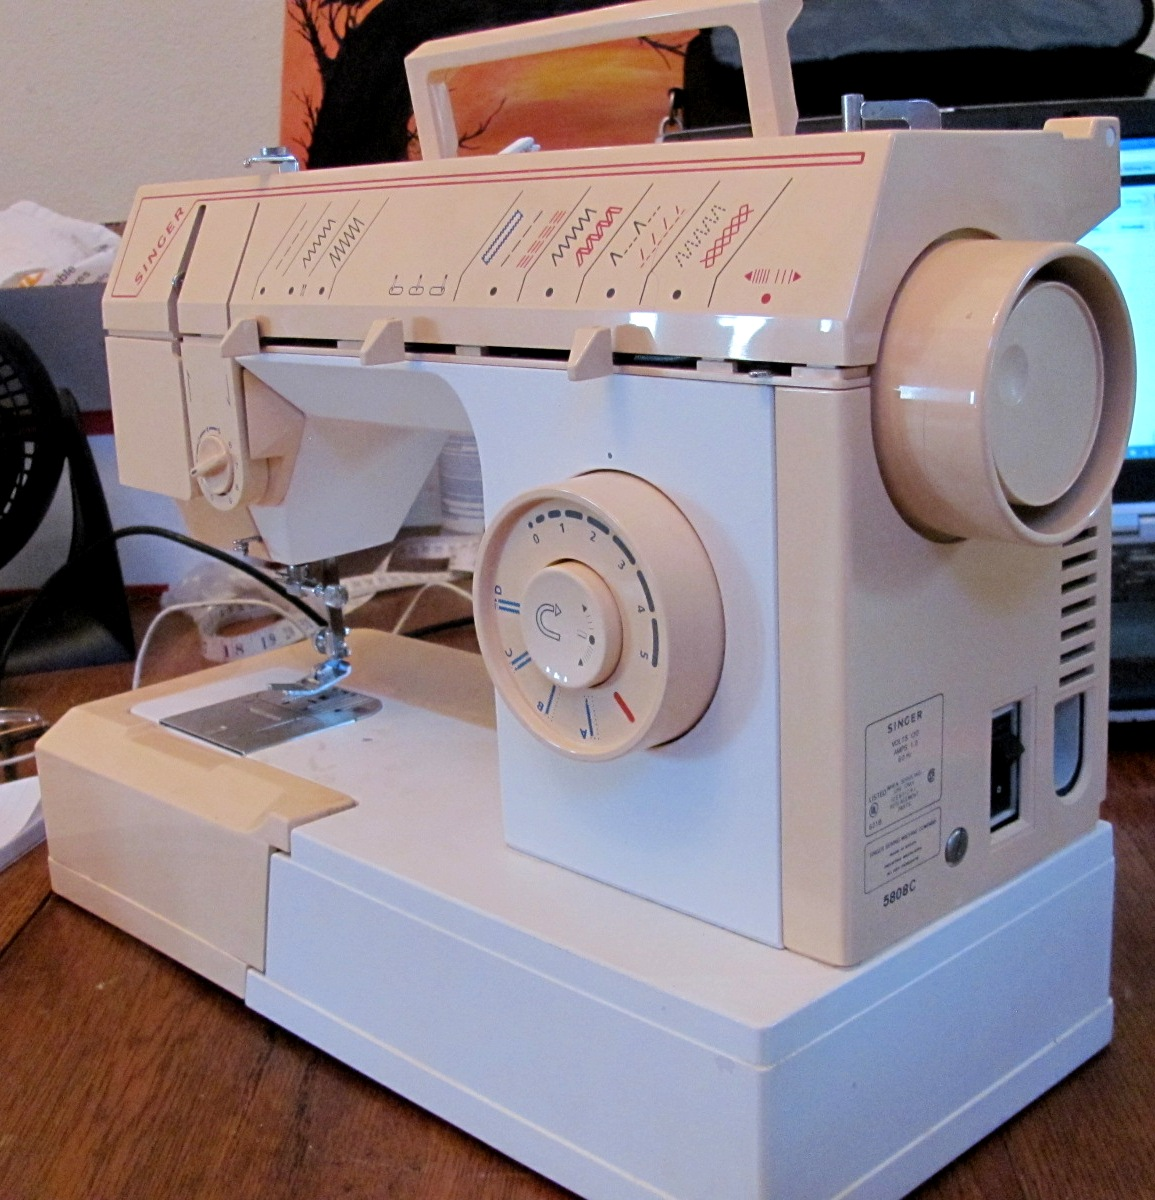 the sewing machine rescue singer 5808c rh sewingmachinerescue blogspot com singer sewing machine 5808c manual singer 5808c manual download